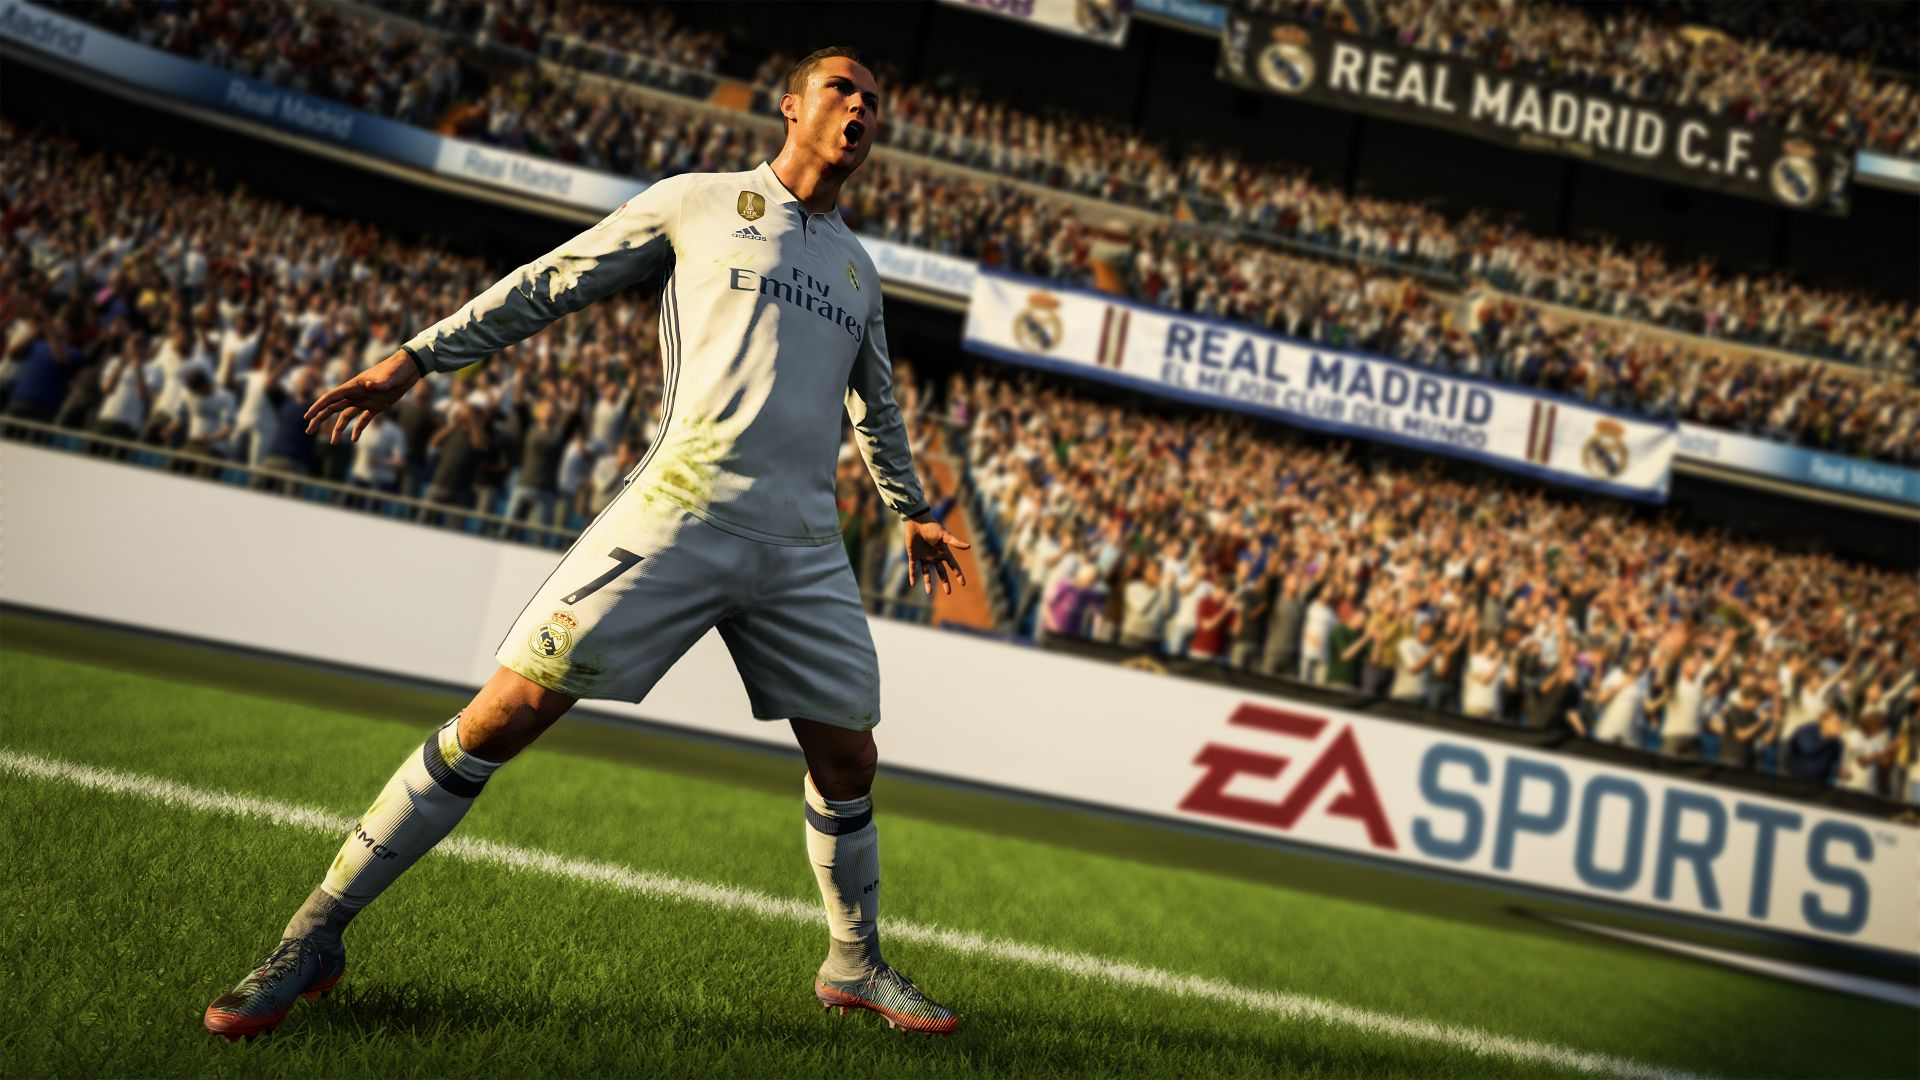 FIFA 18 Ronaldo EA